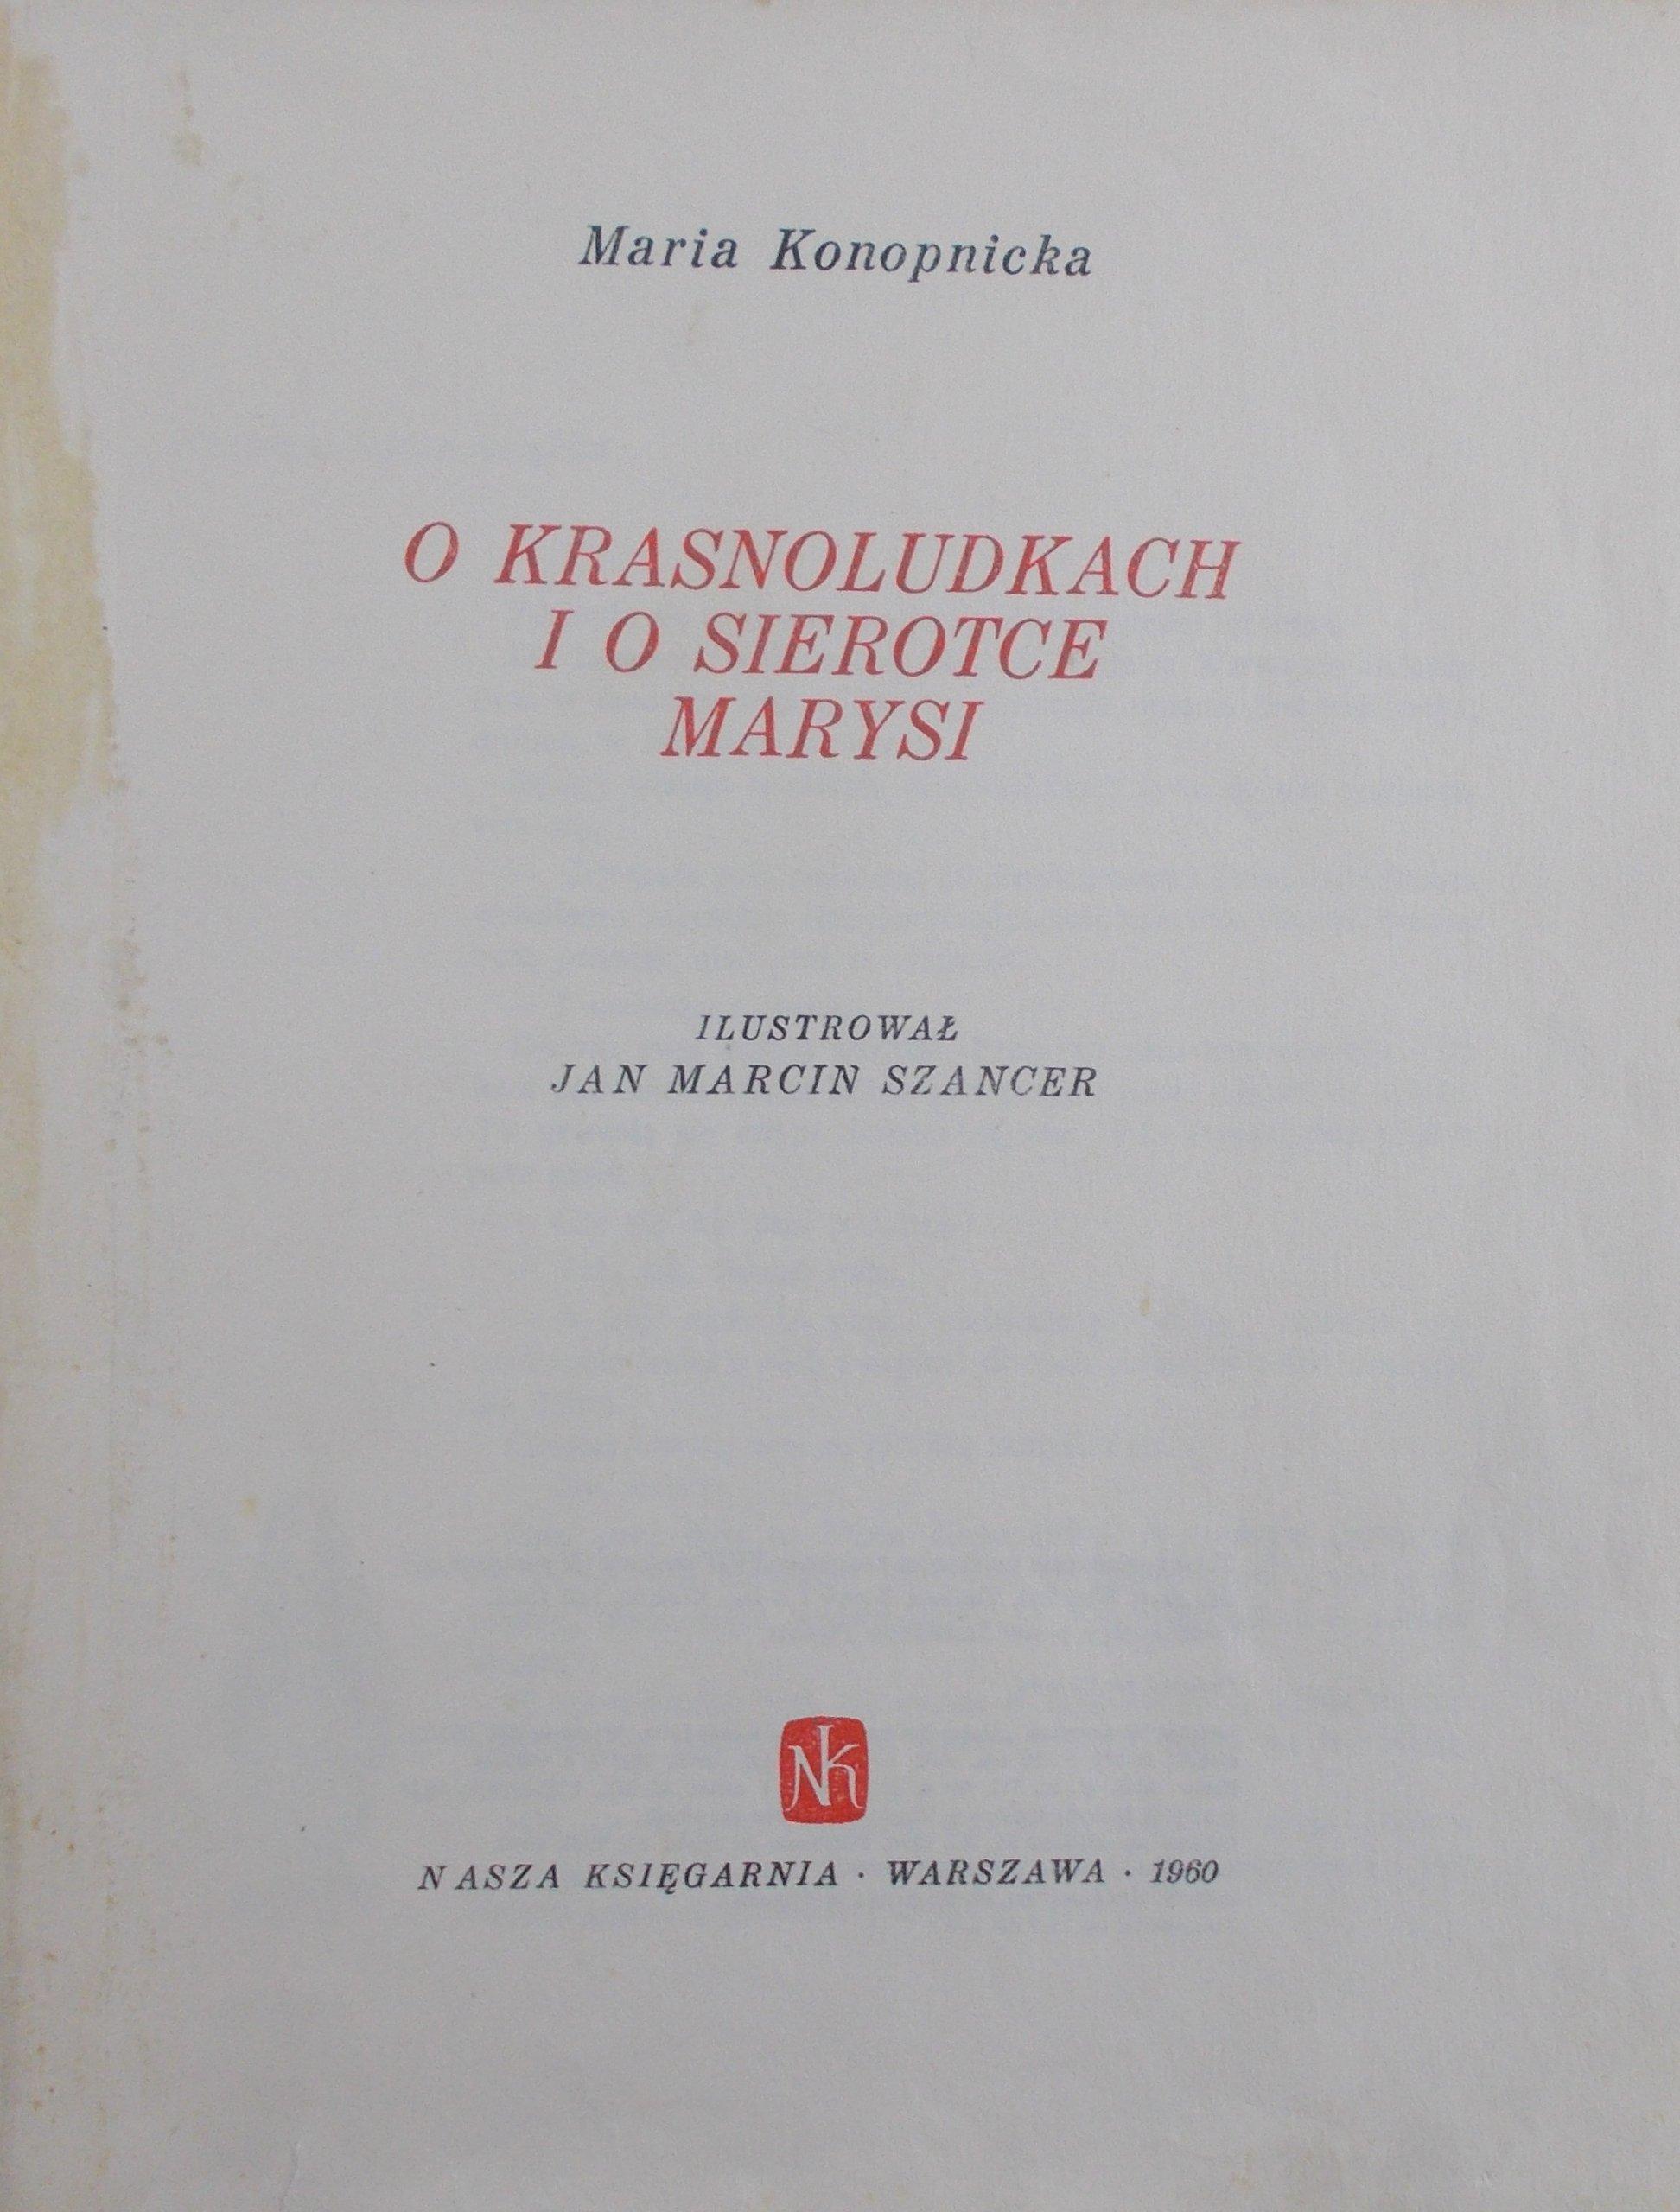 Maria Konopnicka O Krasnoludkach I O Sierotce 7136508943